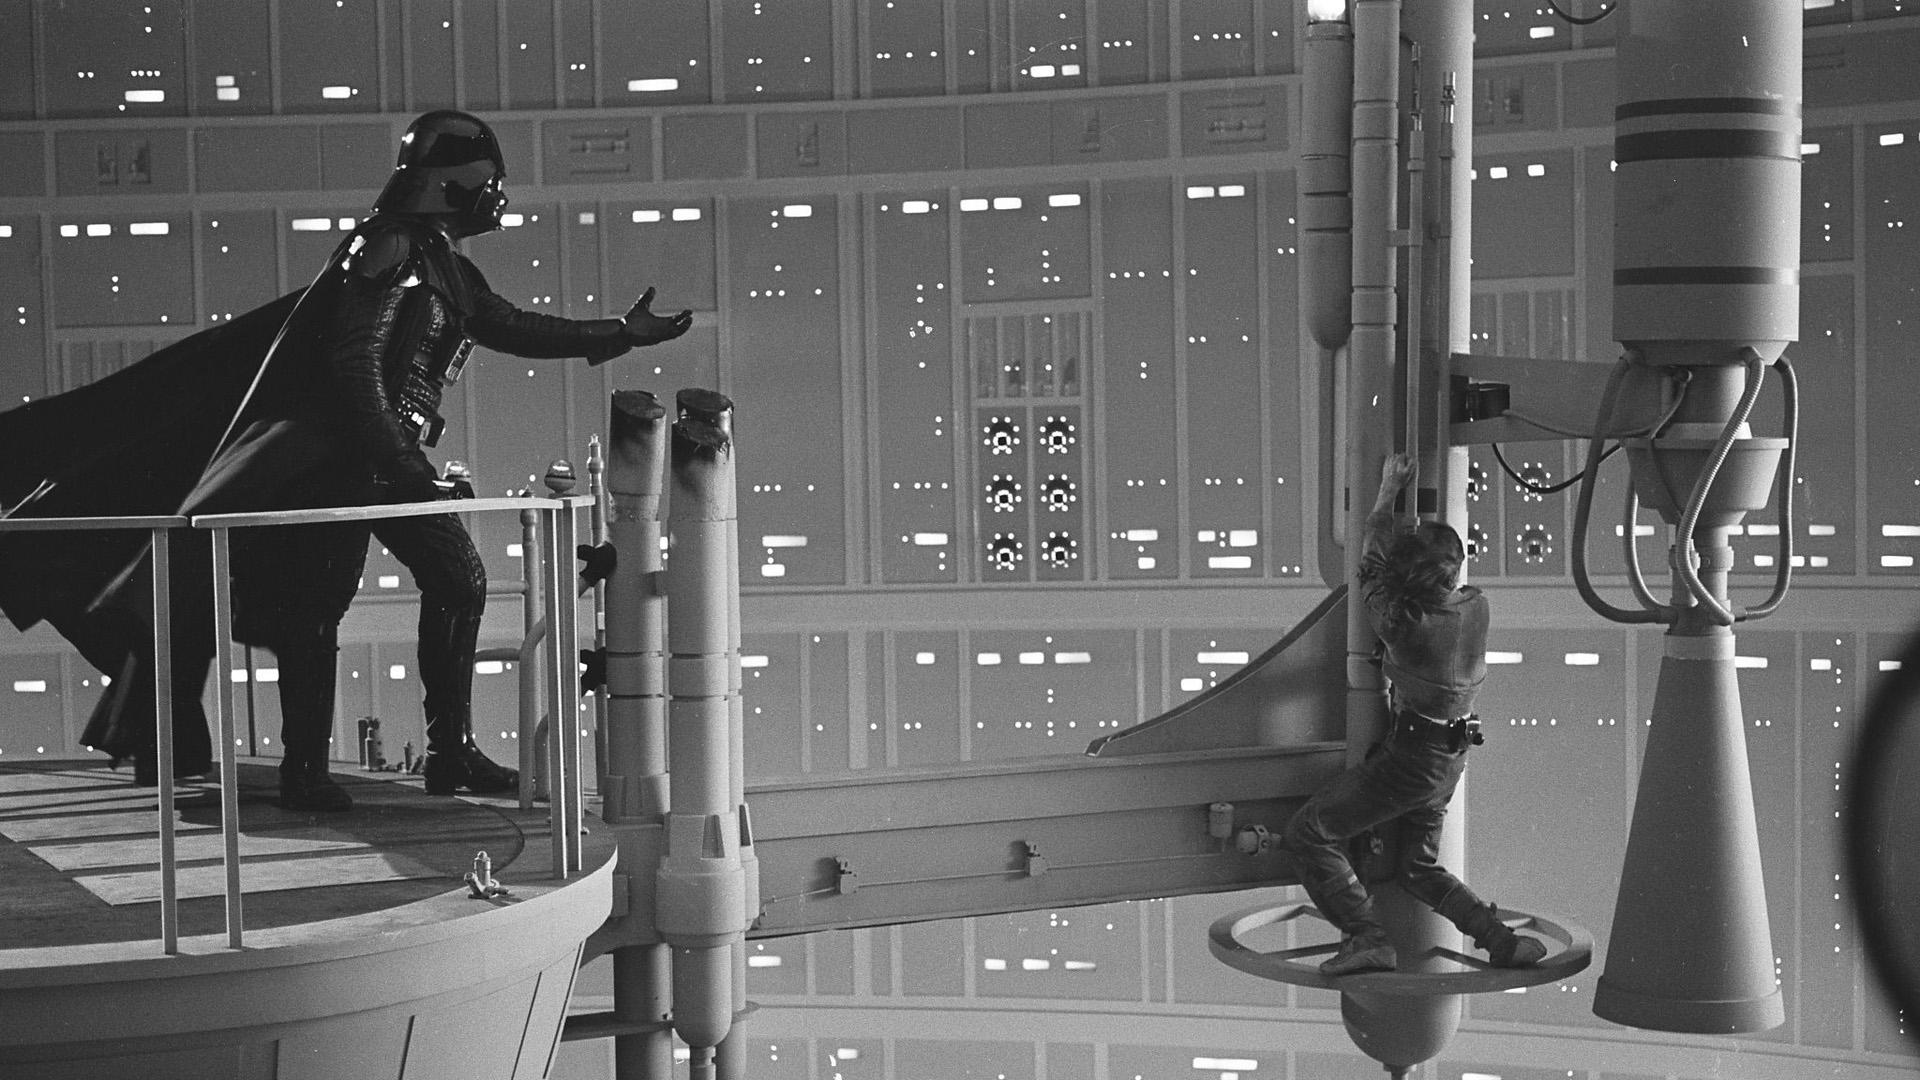 Star Wars Episode V: The Empire Strikes Back Computer